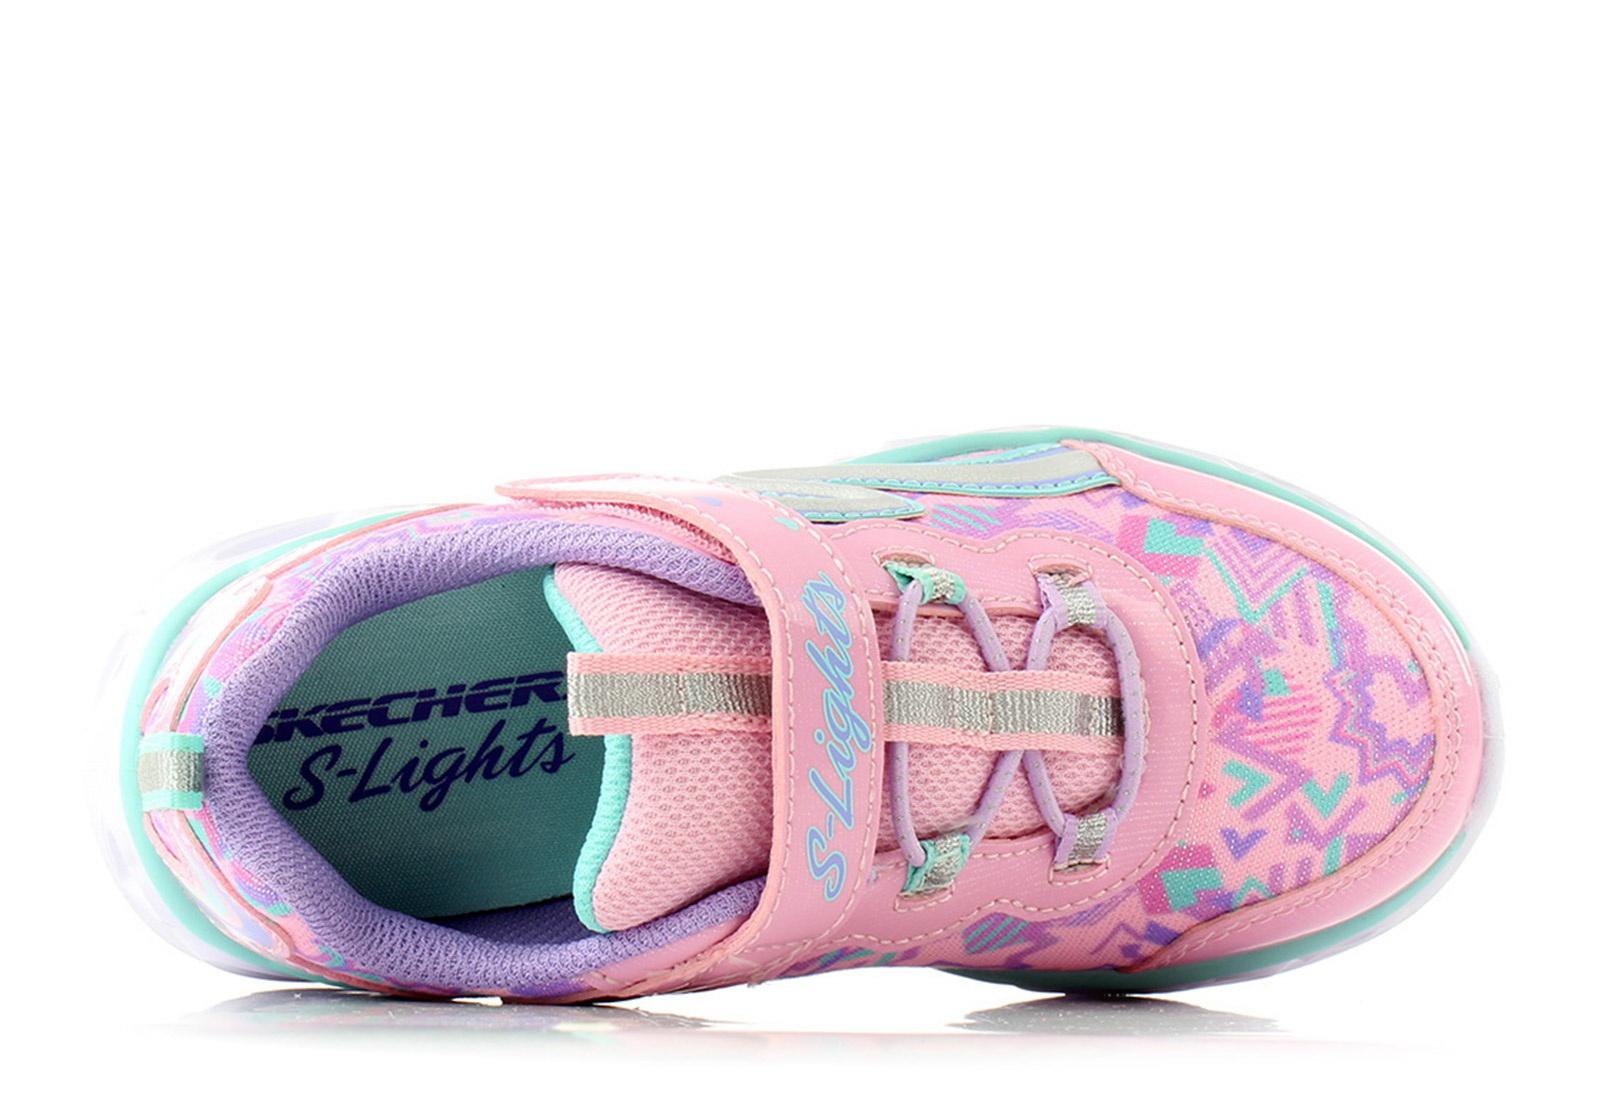 8e188661f8ca Skechers Cipő - Heart Lights - 20180N-lpmt - Office Shoes Magyarország